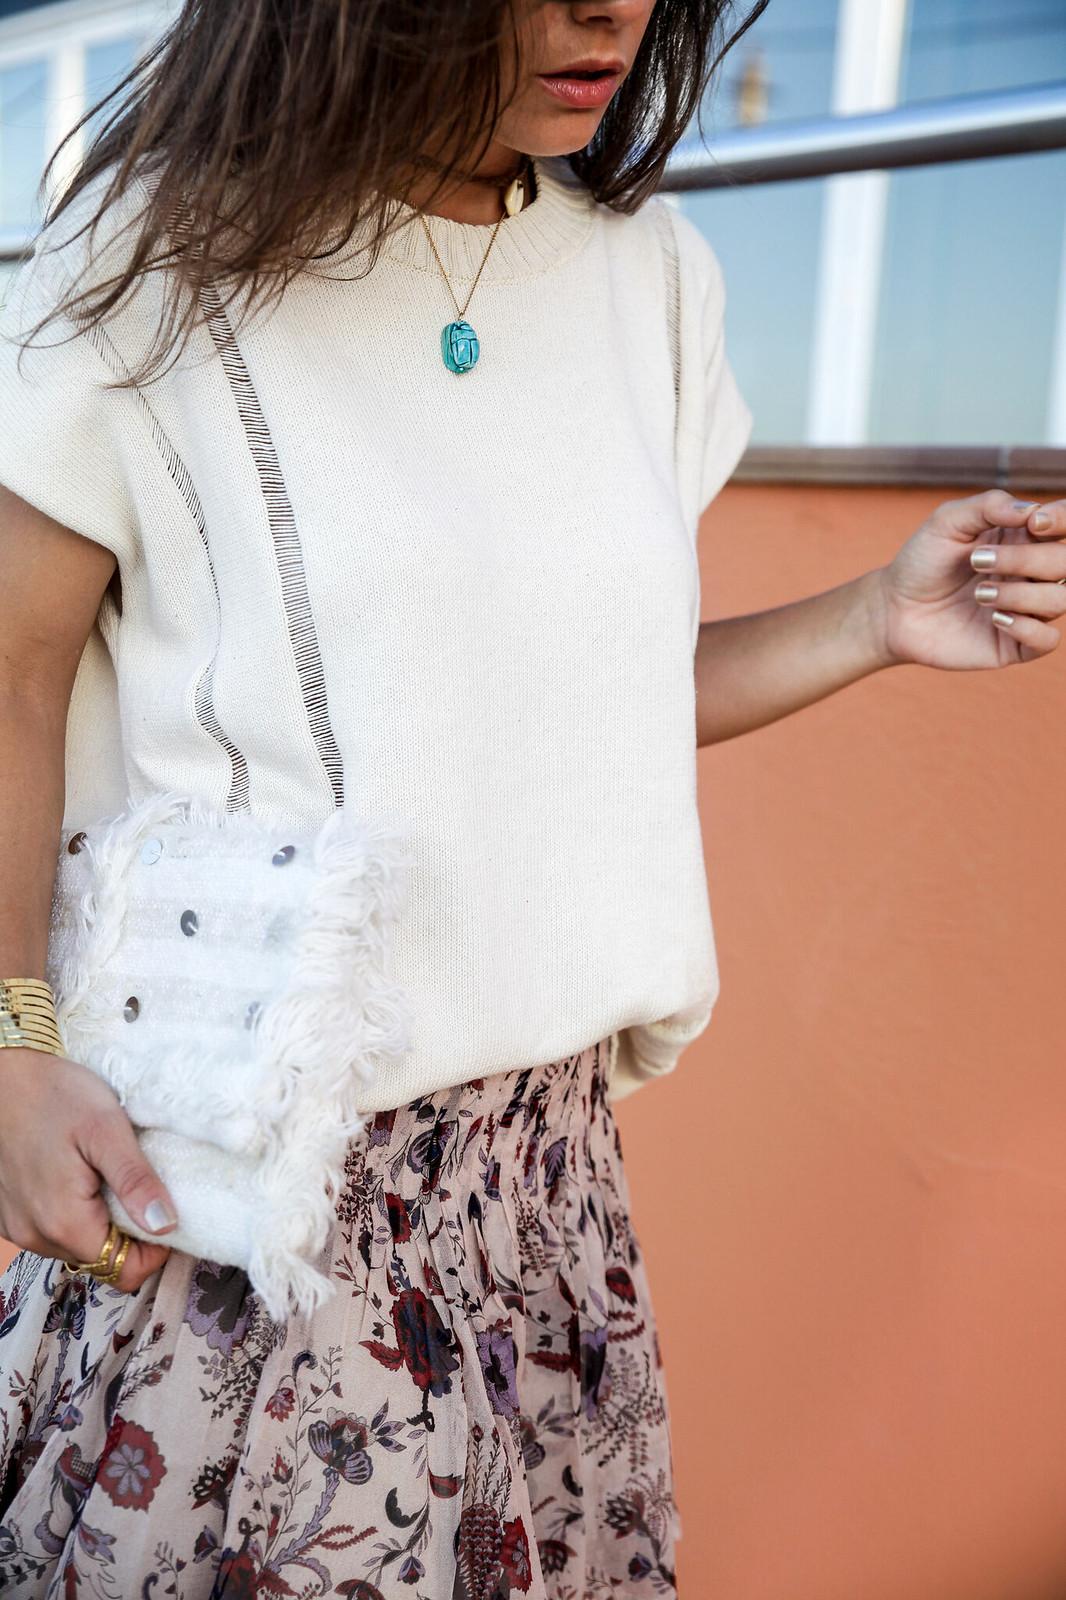 05_blusa_punto_falda_flores_summer_outfit_theguestgirl_rüga_schade_jewels_steve_madden_.magali_pasacal_influencer_barcelona_blogger